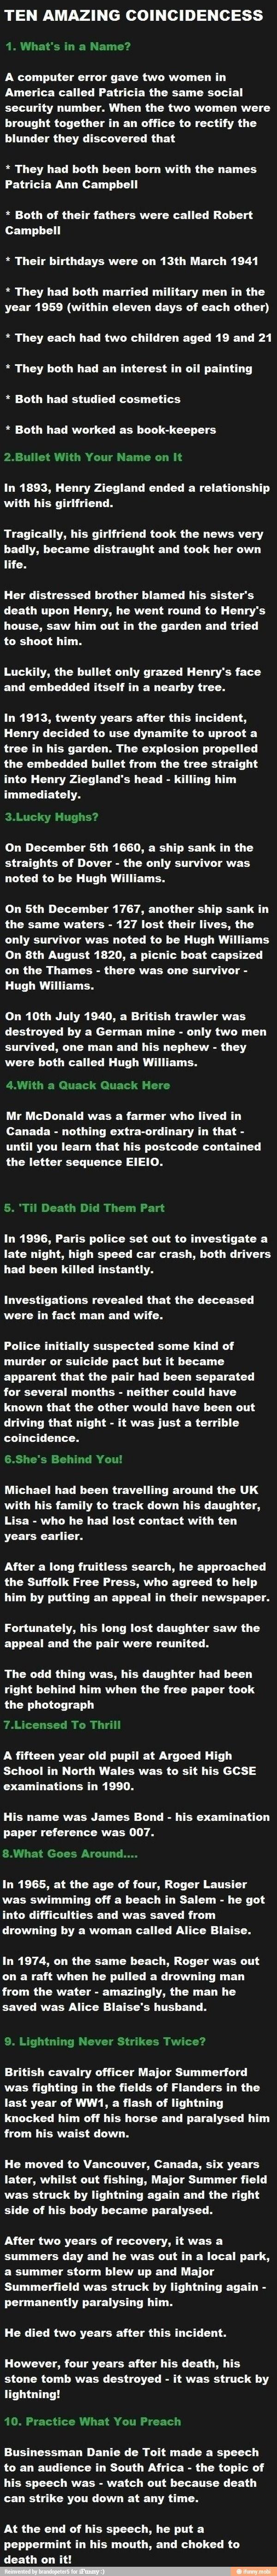 Ten Amazing Coincidences